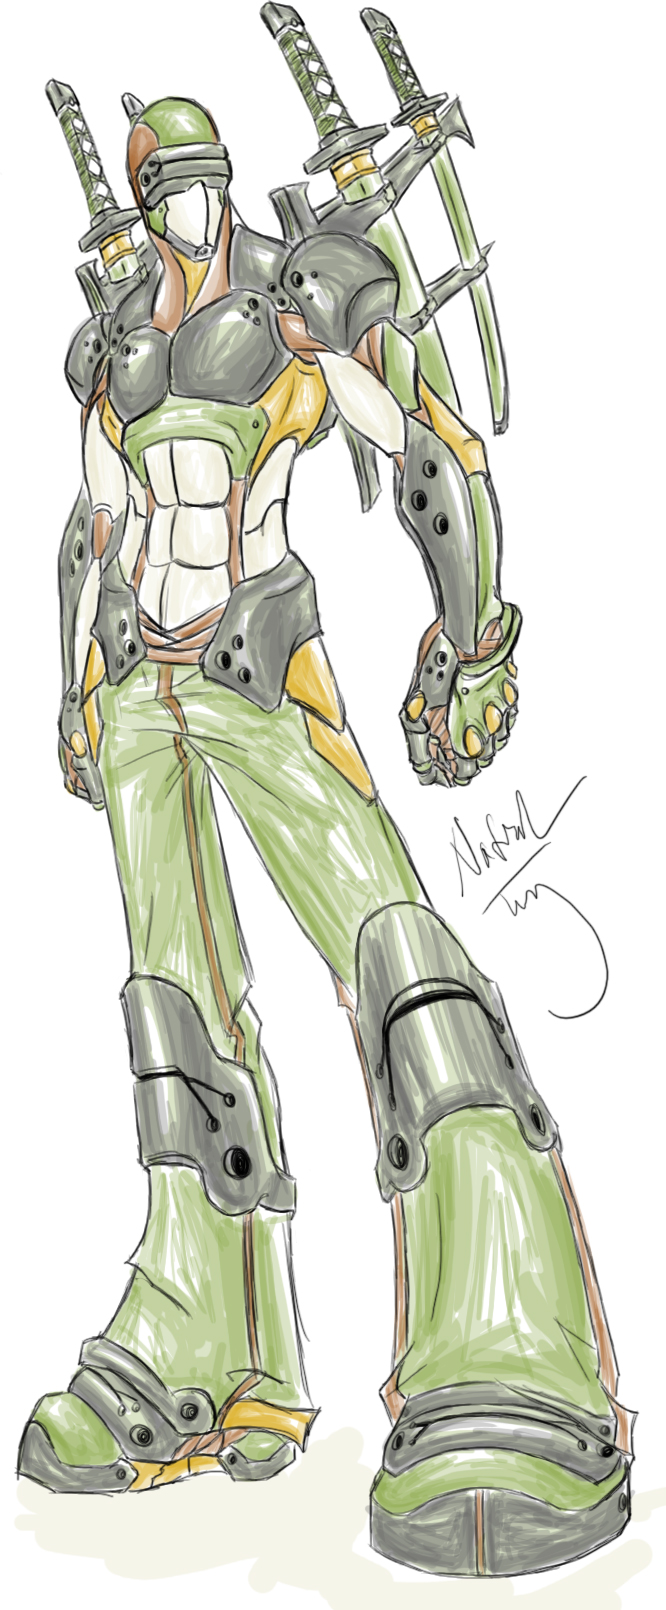 Army Ninja Cyborg Dude by Tyshea